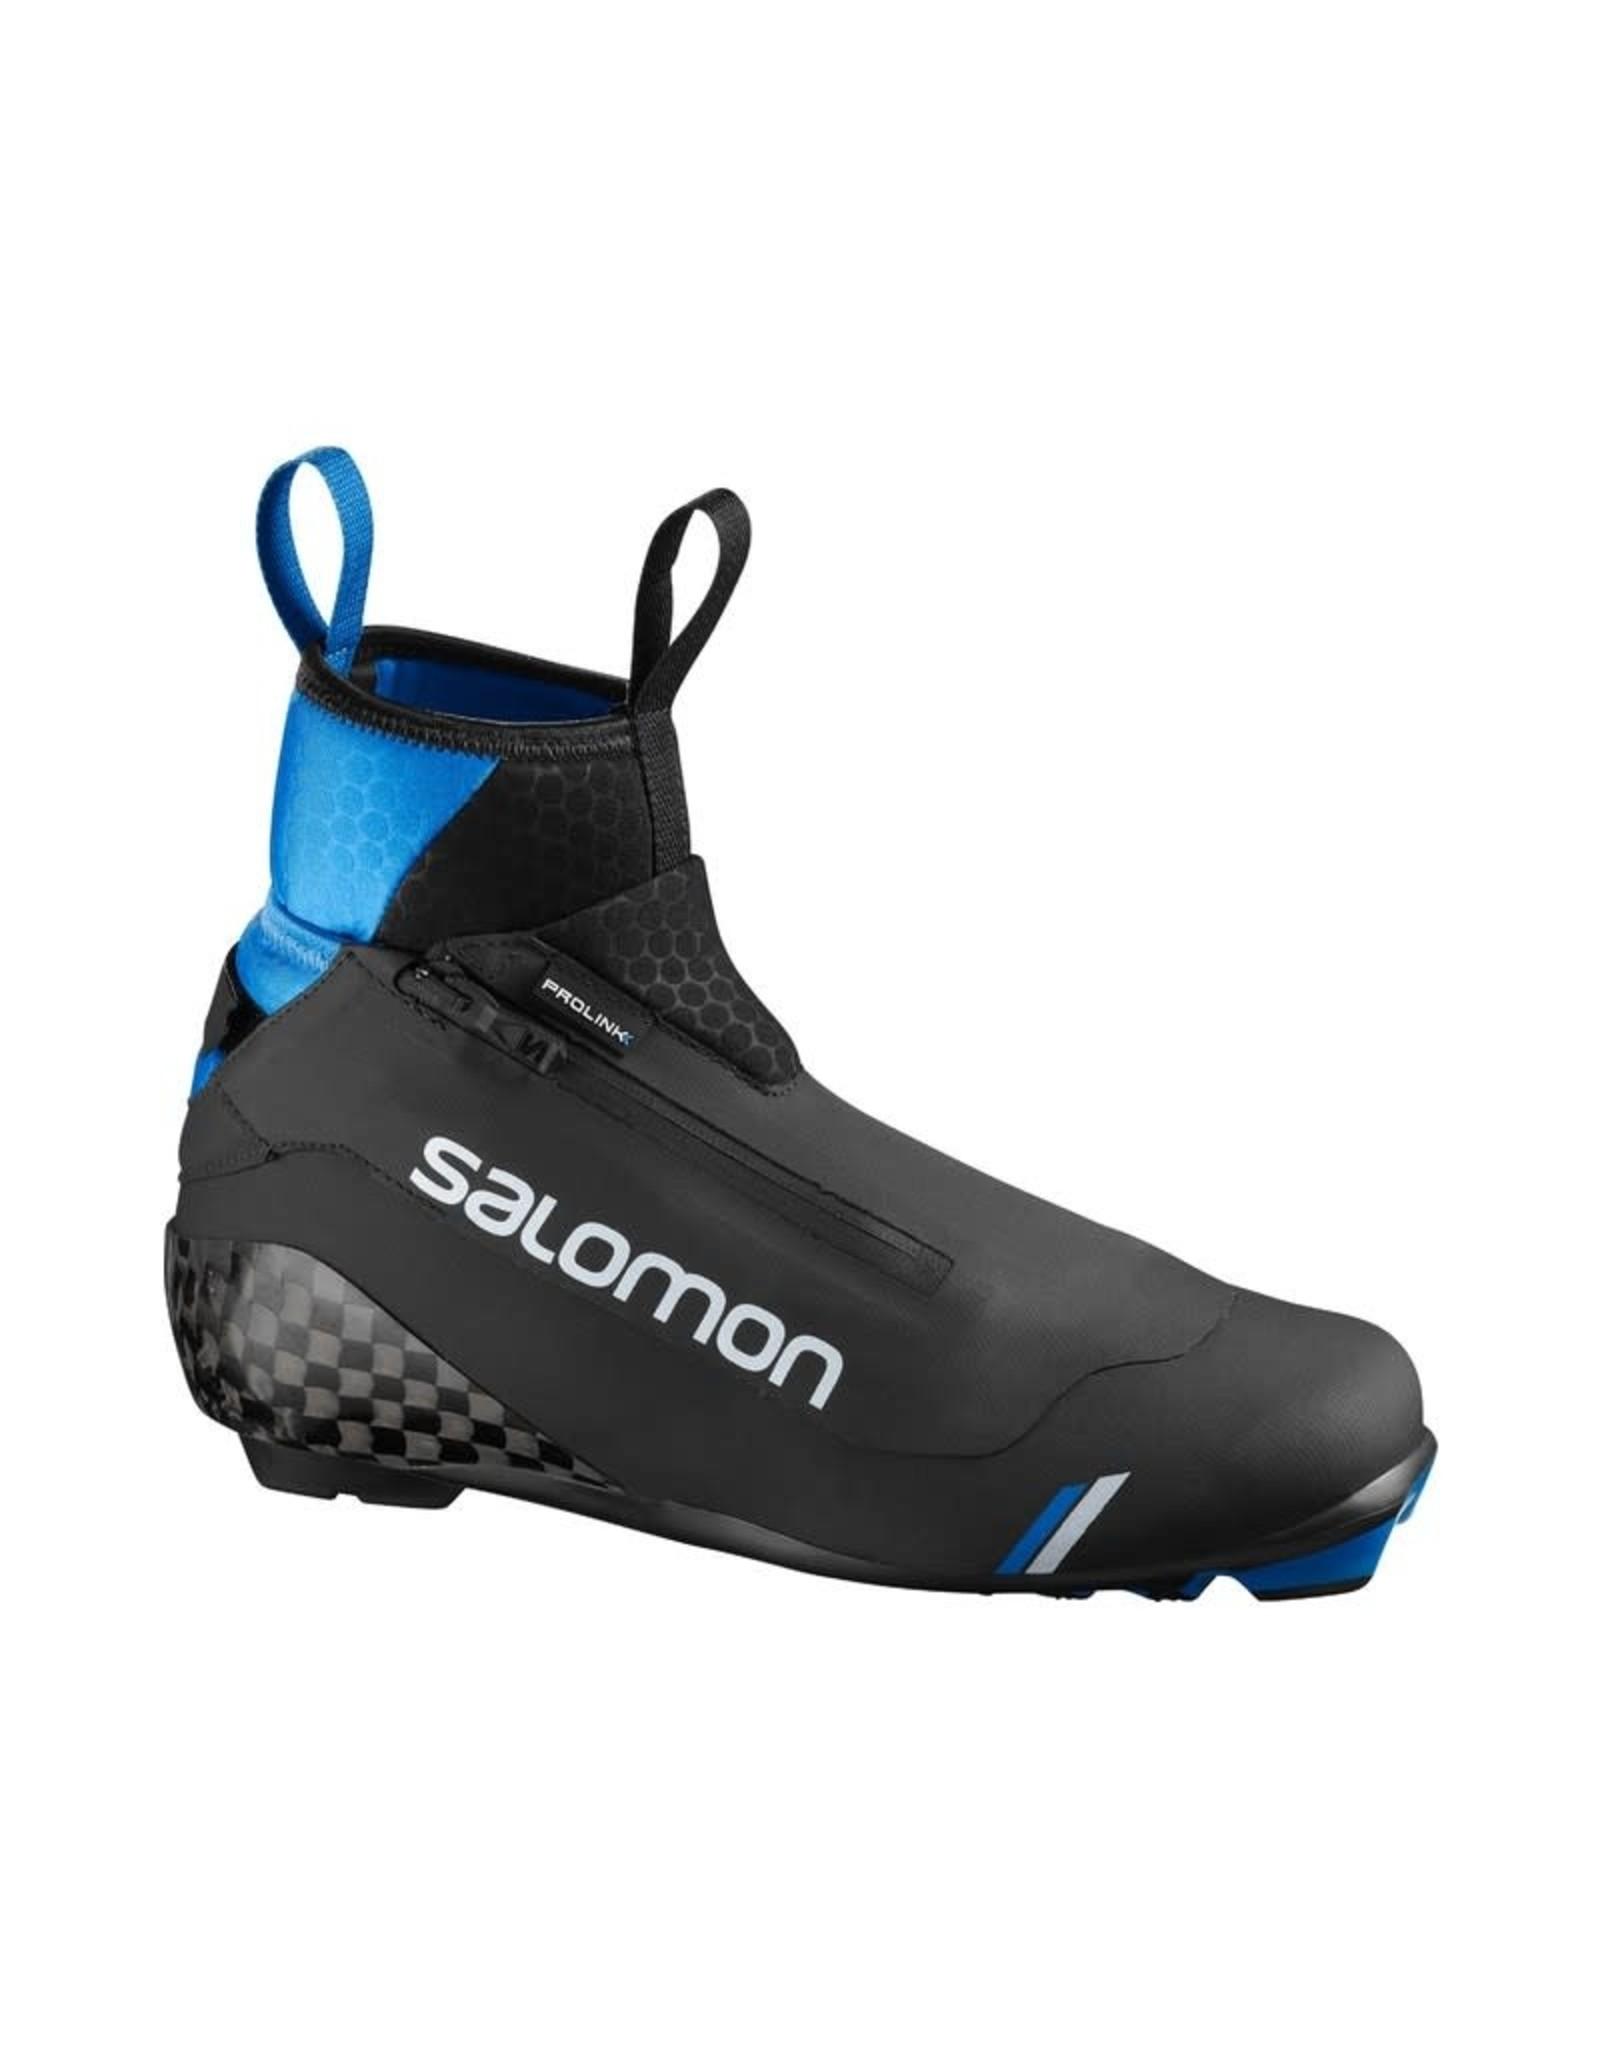 SALOMON '21, Salomon, Boot, S/Race Classic Prolink